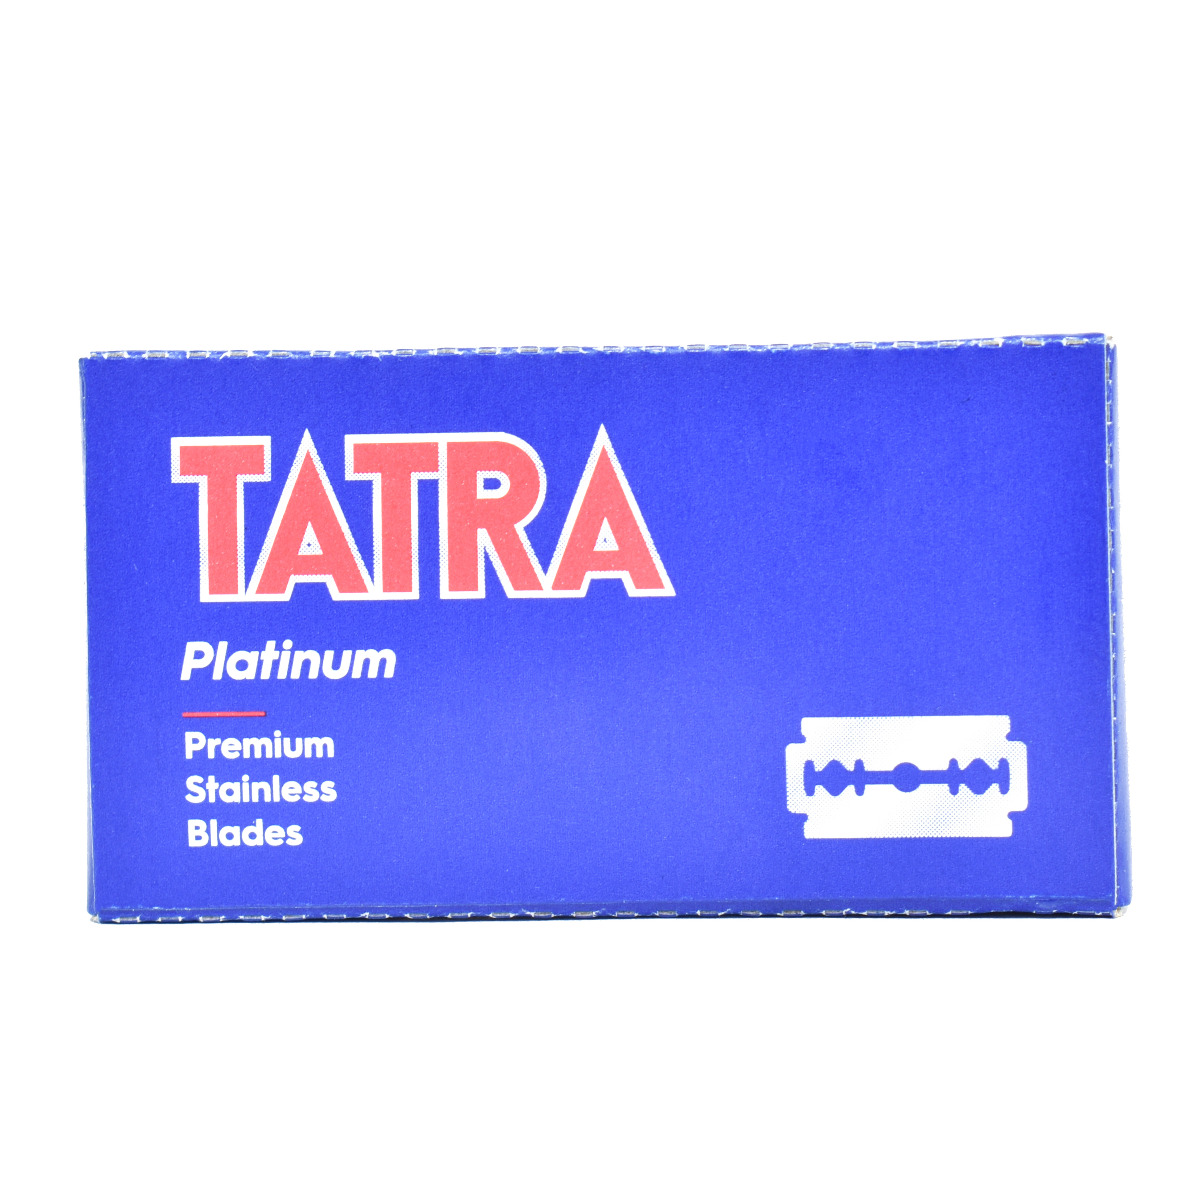 Tatra Platinum Double Edge Safety Razor Blades (x5)